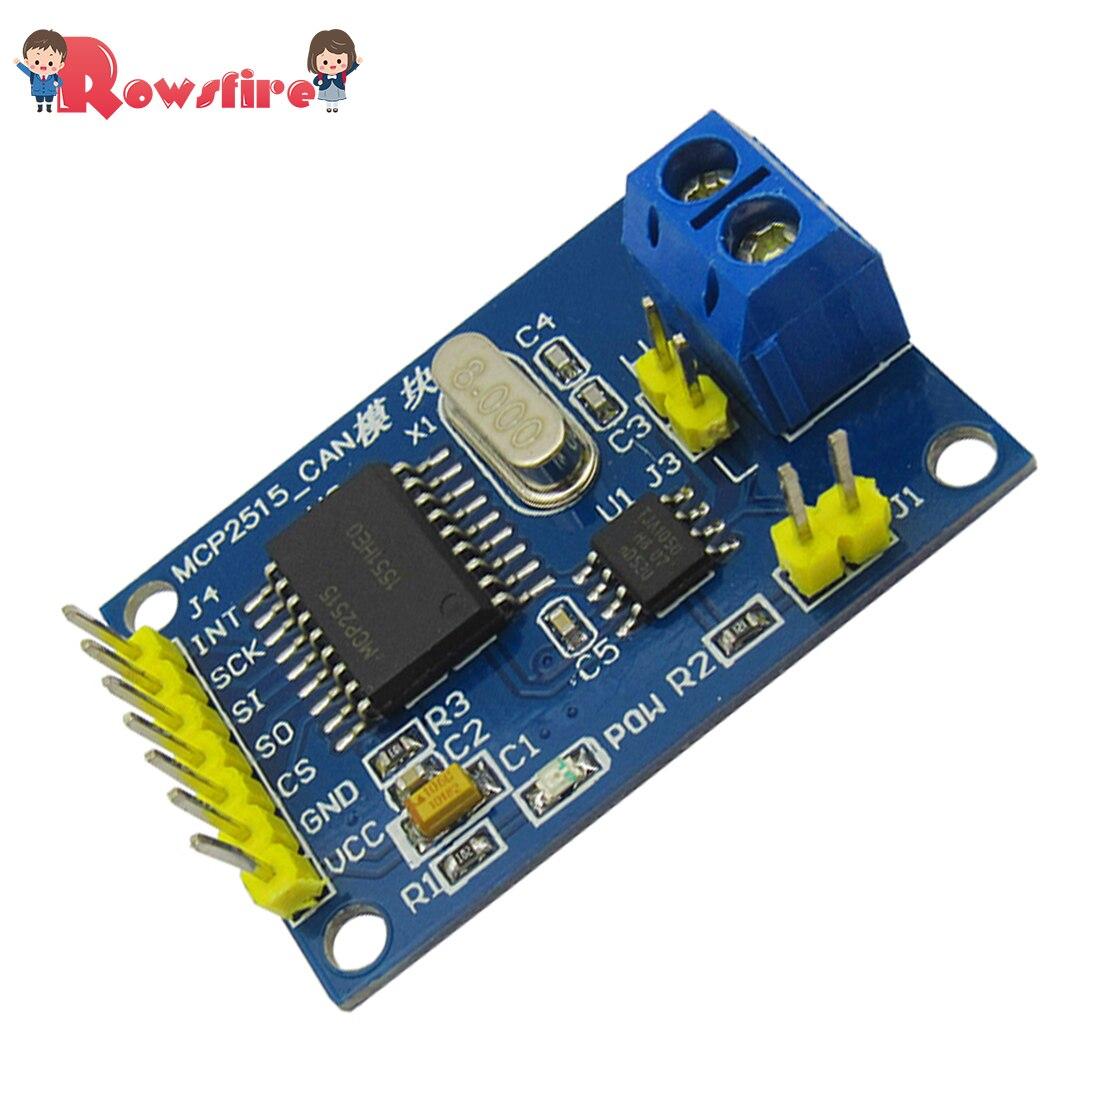 MCP2515 TJA1050 Receiver SPI Protocol MCU-51 Routines CAN Bus Module